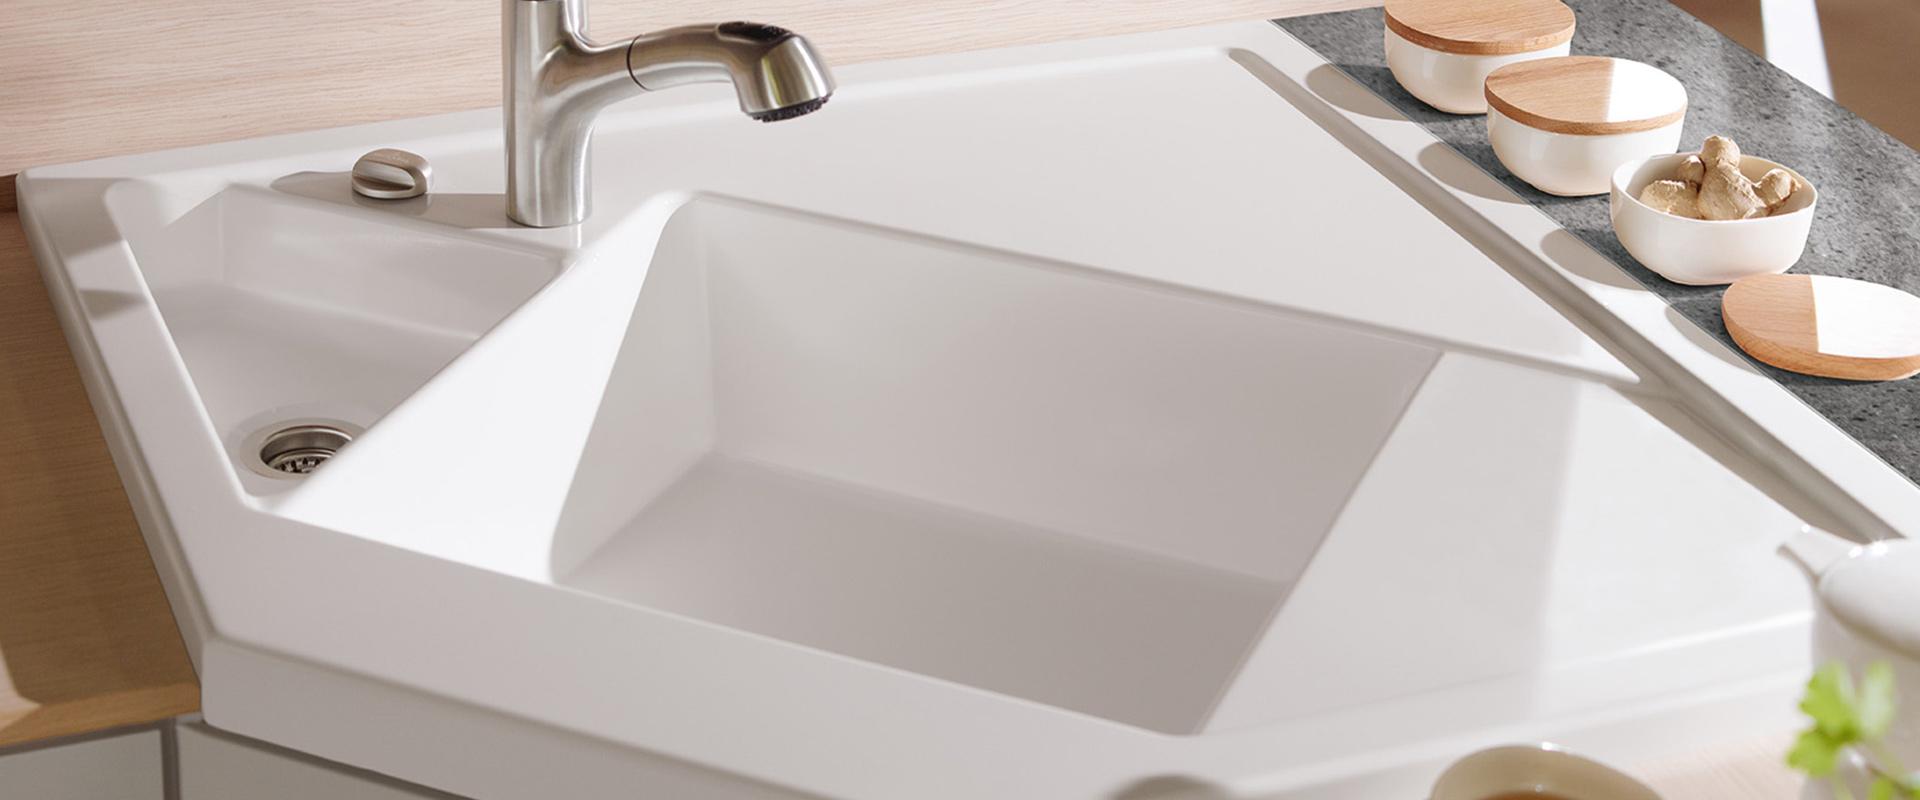 küche waschbecken villeroy boch ~ Logisting.com = Varie Forme di ...